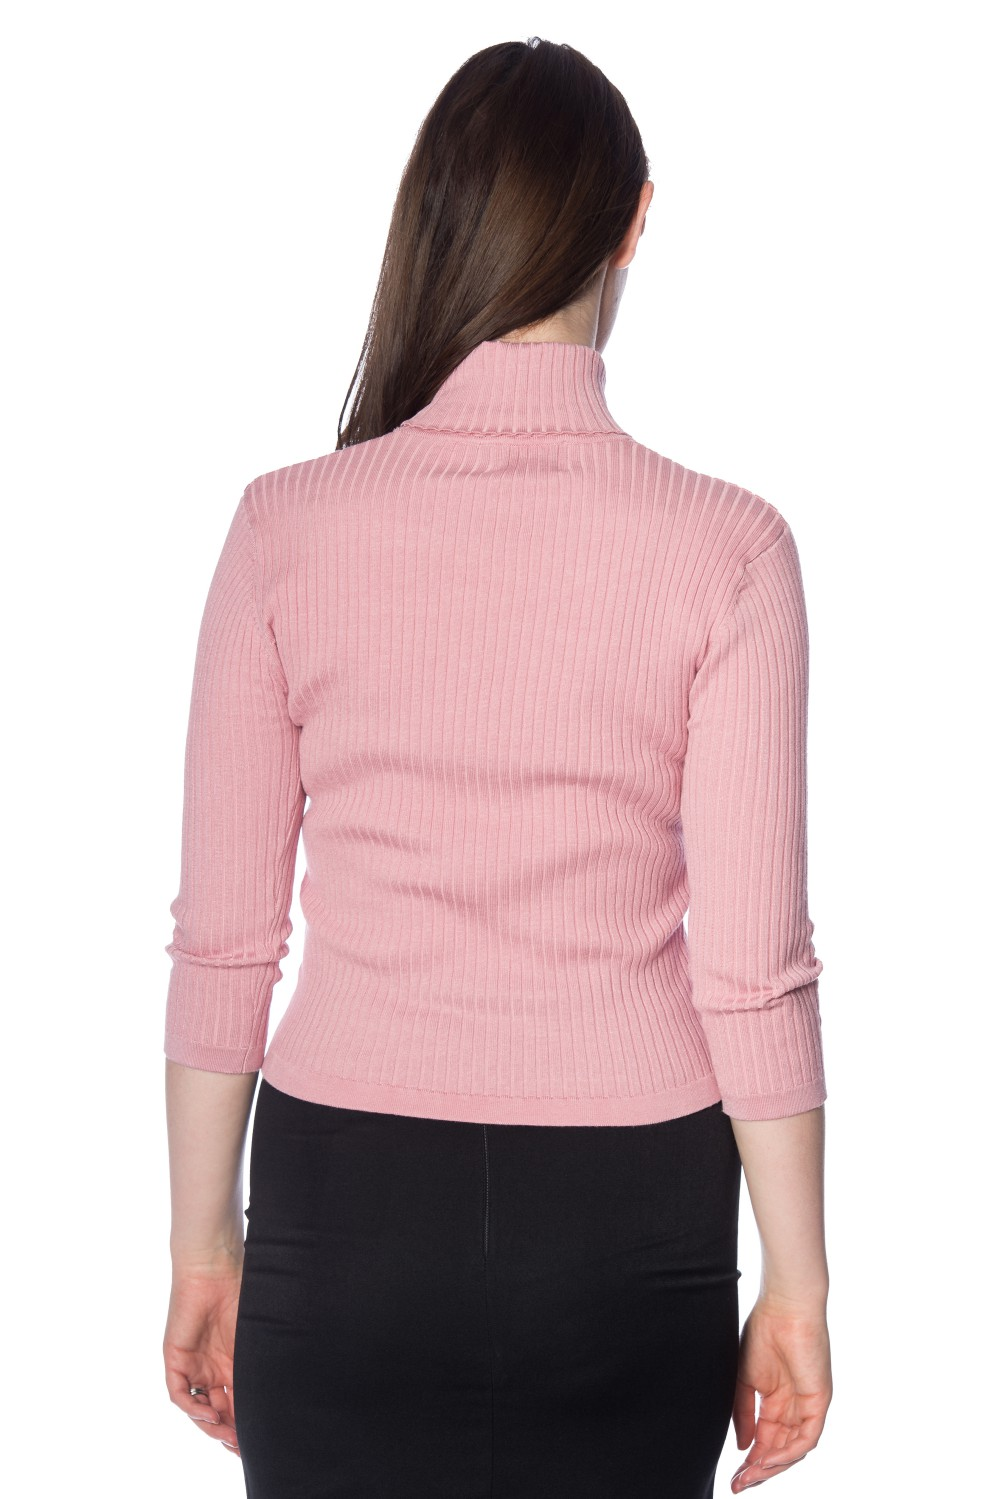 Banned Retro 60s Dusky Pink Louise Turtleneck Knit Top